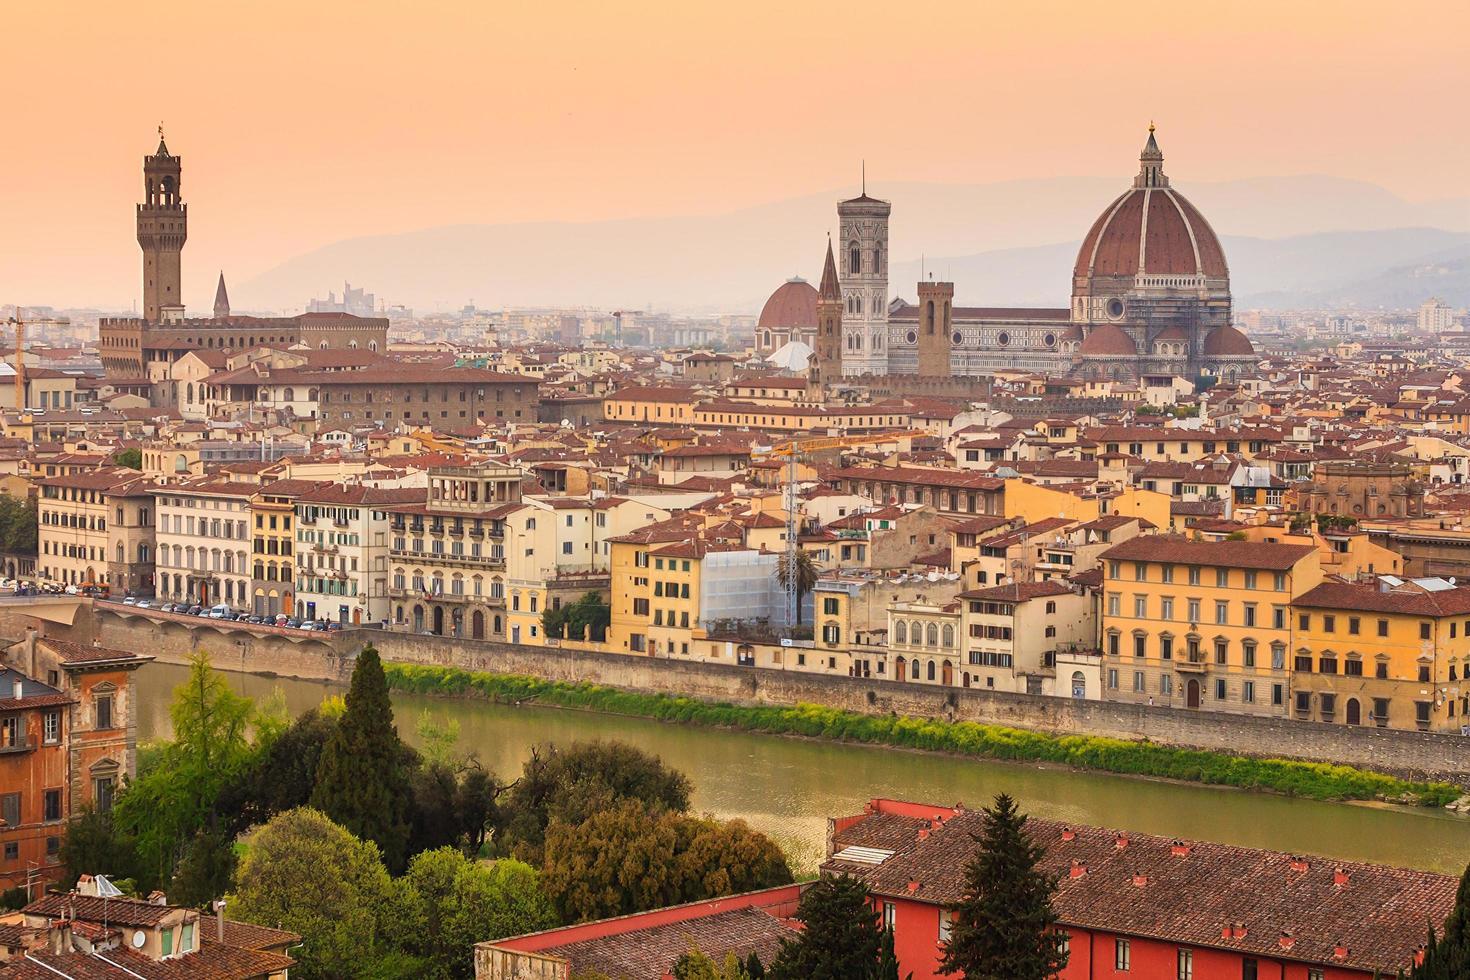 Florence stad tijdens zonsondergang foto